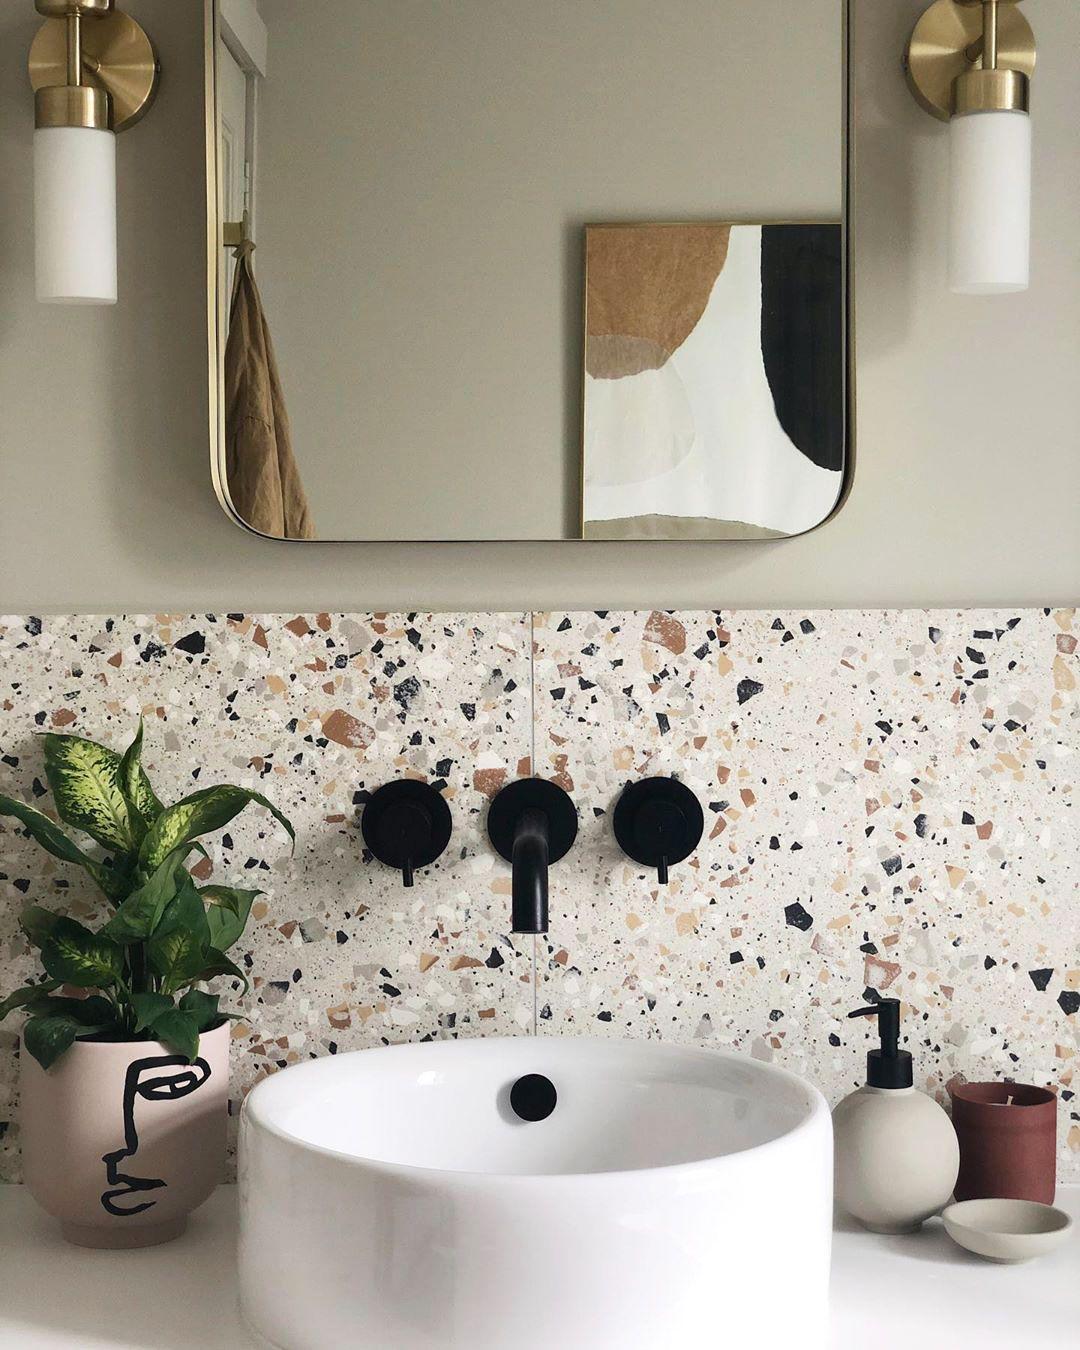 25 Best Modern Bathroom Decorating Ideas Modern Bathroom Decor Bathroom Interior Design Bathroom Interior